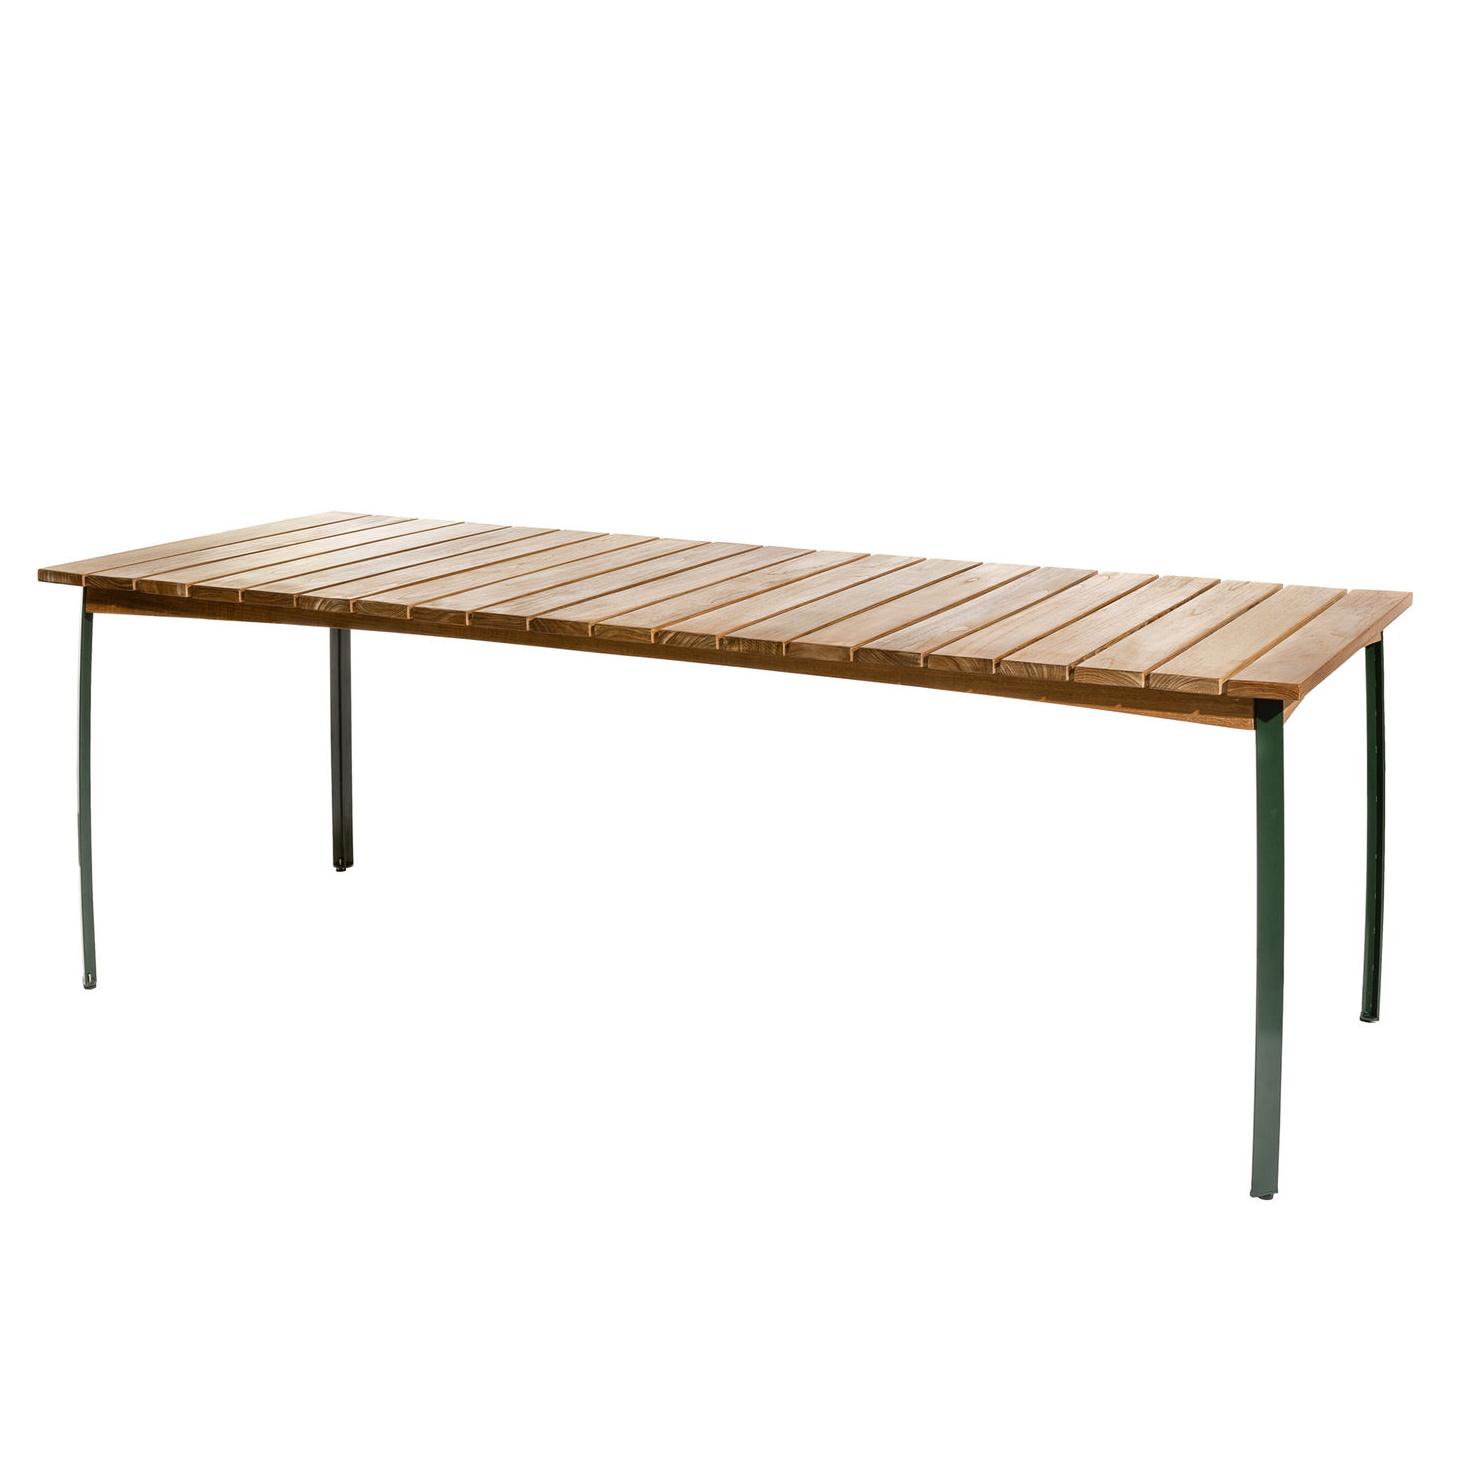 Kerteminde teakbord 200 cm, Skargaarden